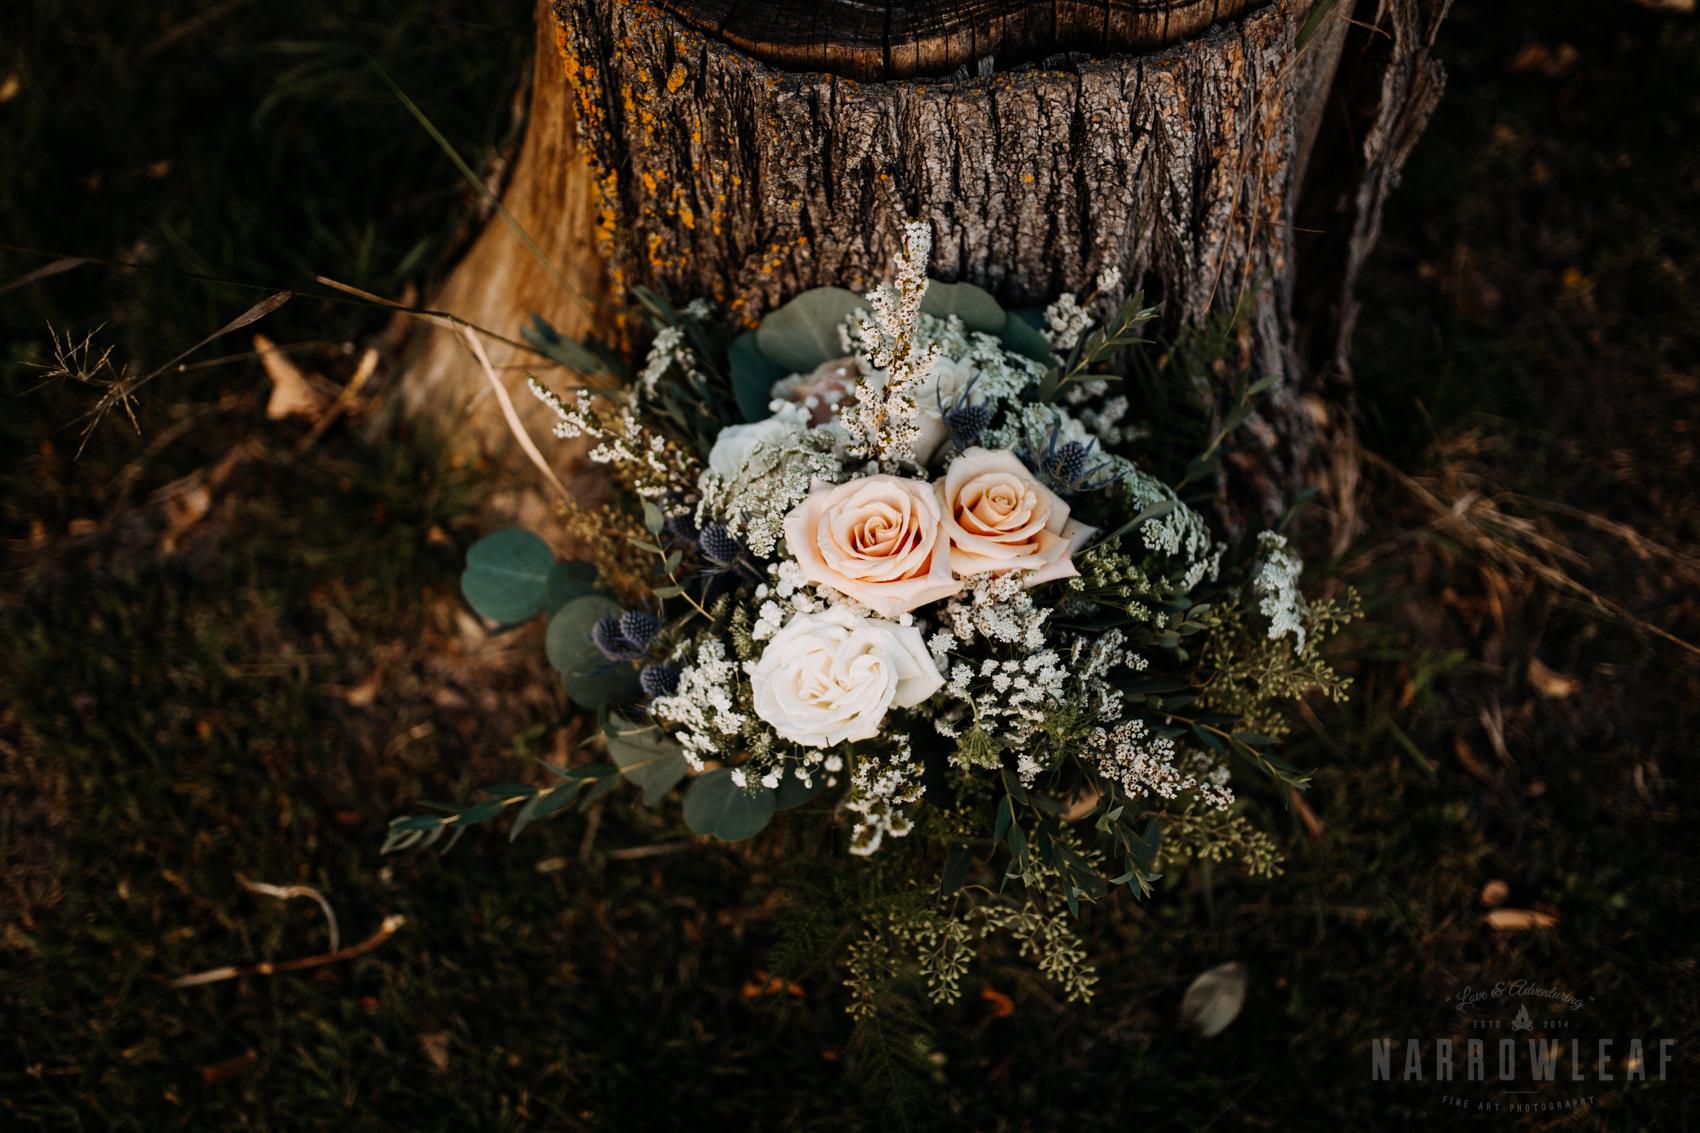 pinks-and-greens-wild-flower-bouquet-log-32.jpg